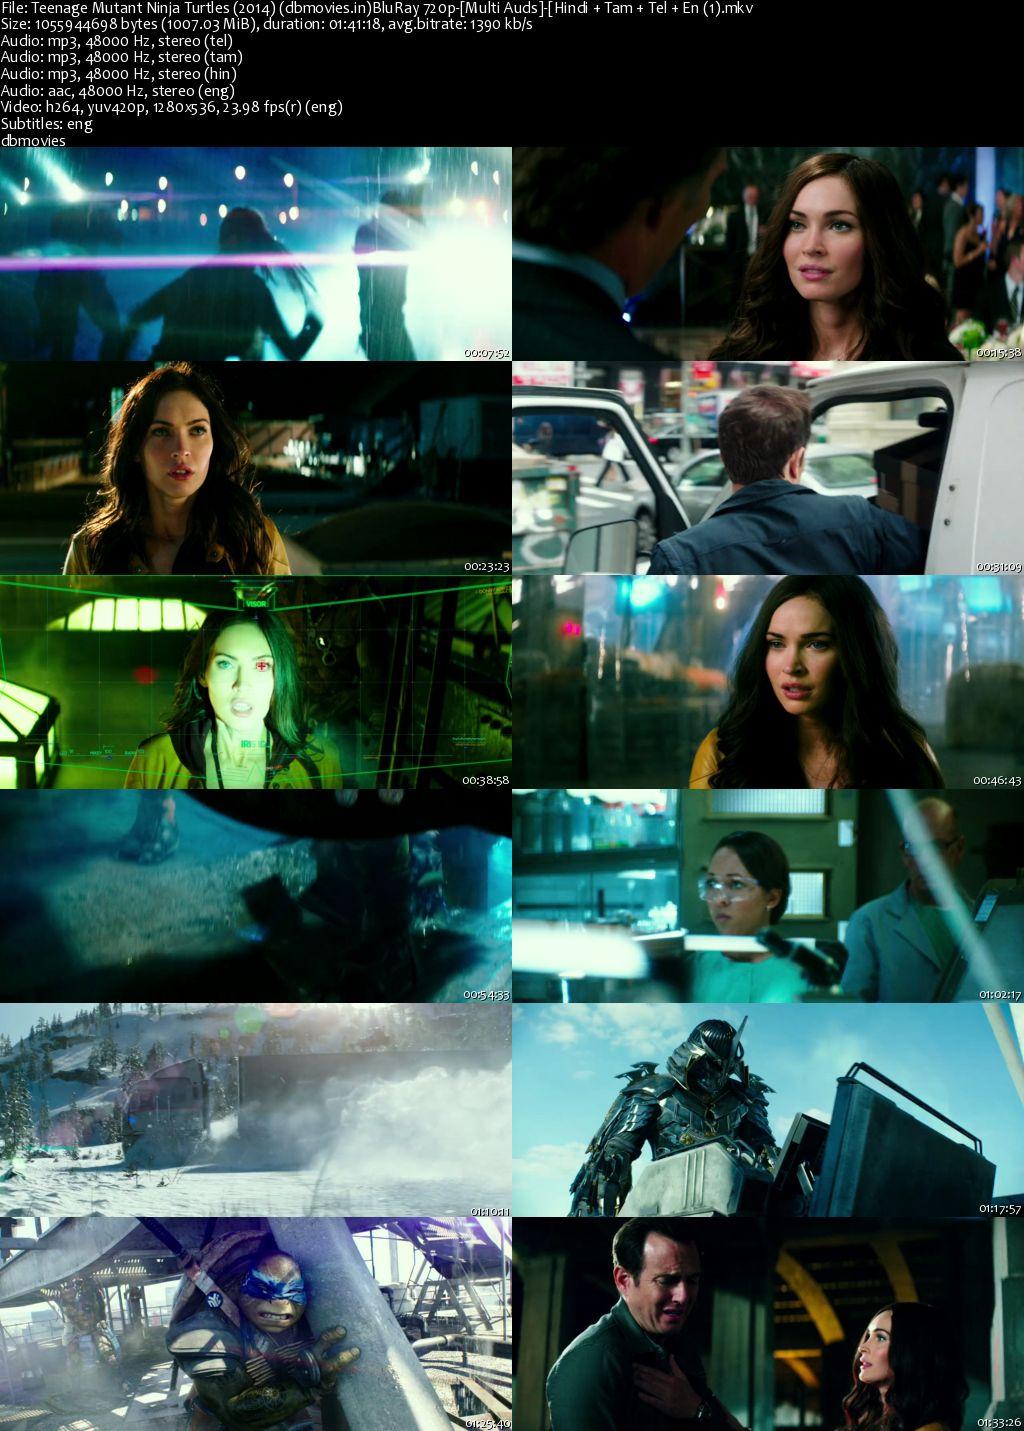 screen shot Teenage Mutant Ninja Turtles 2014 Full Movie Download Dual Audio Hindi 720p